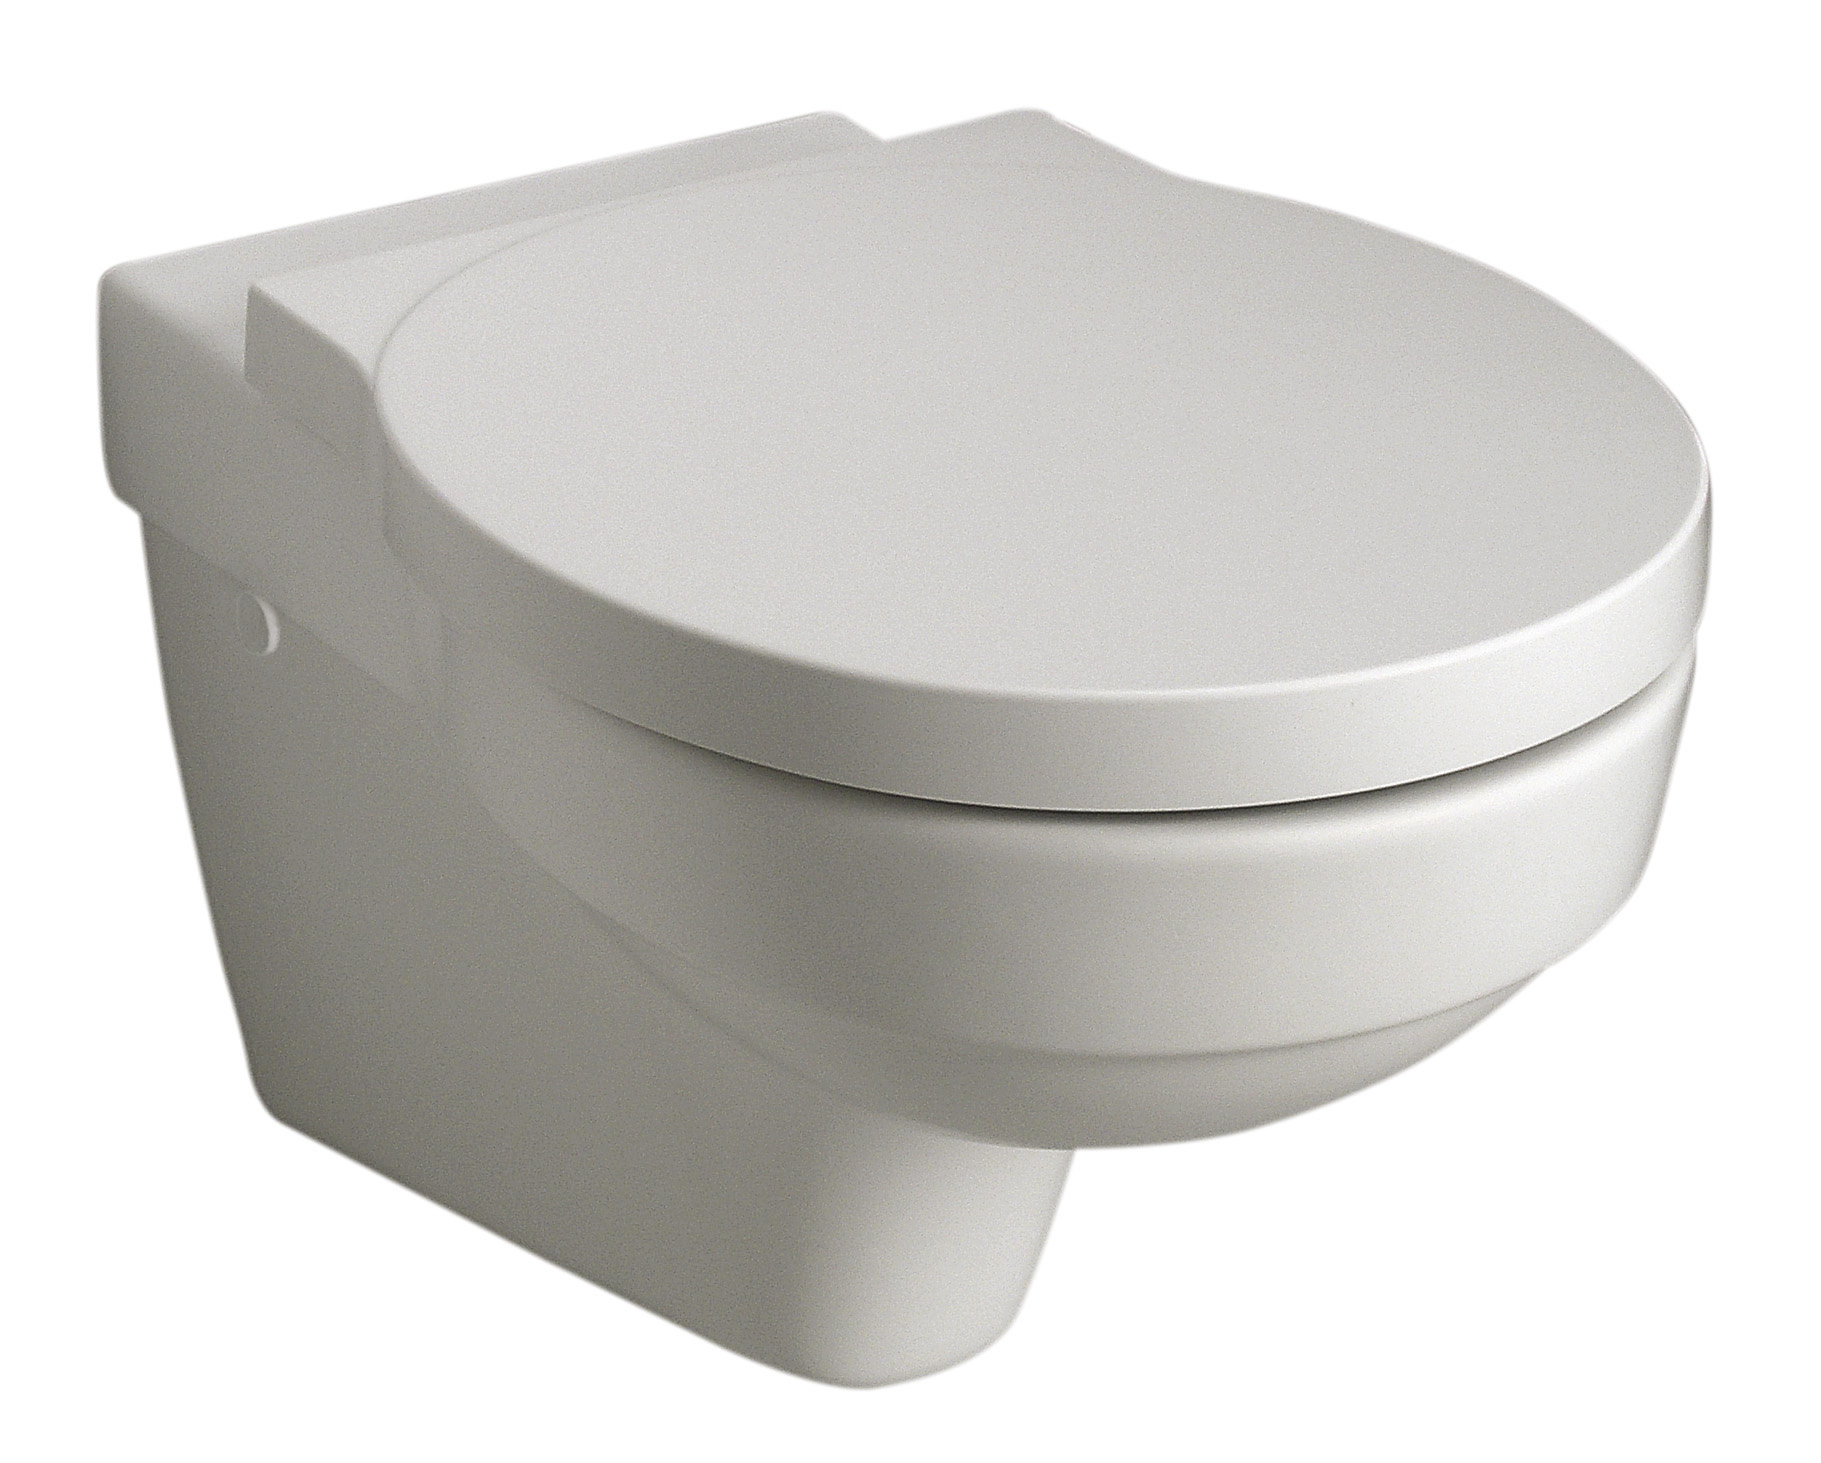 wc/klozety Kolo VARIUS K33100 WC závěsné